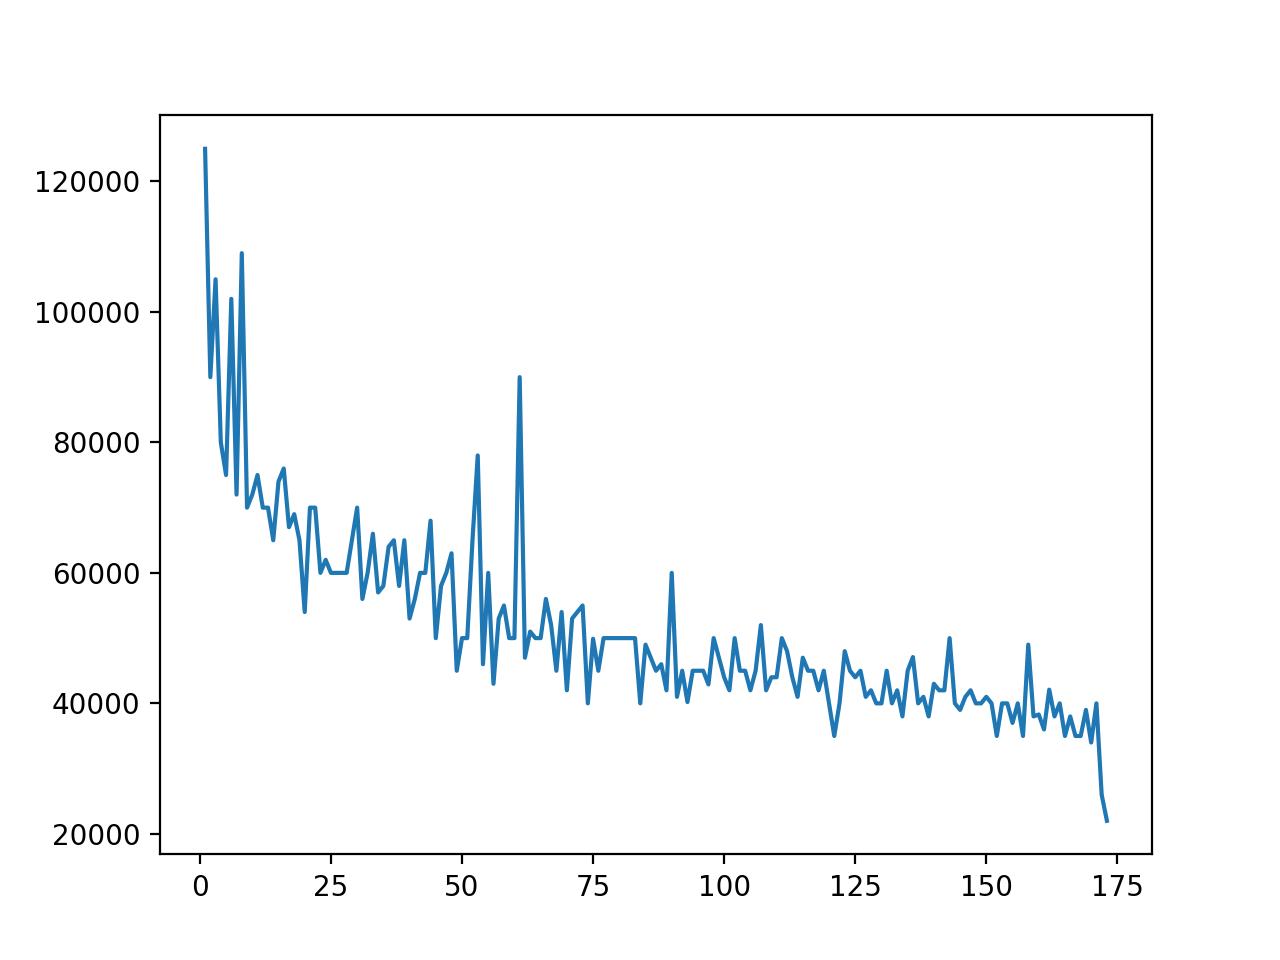 line plot with P75